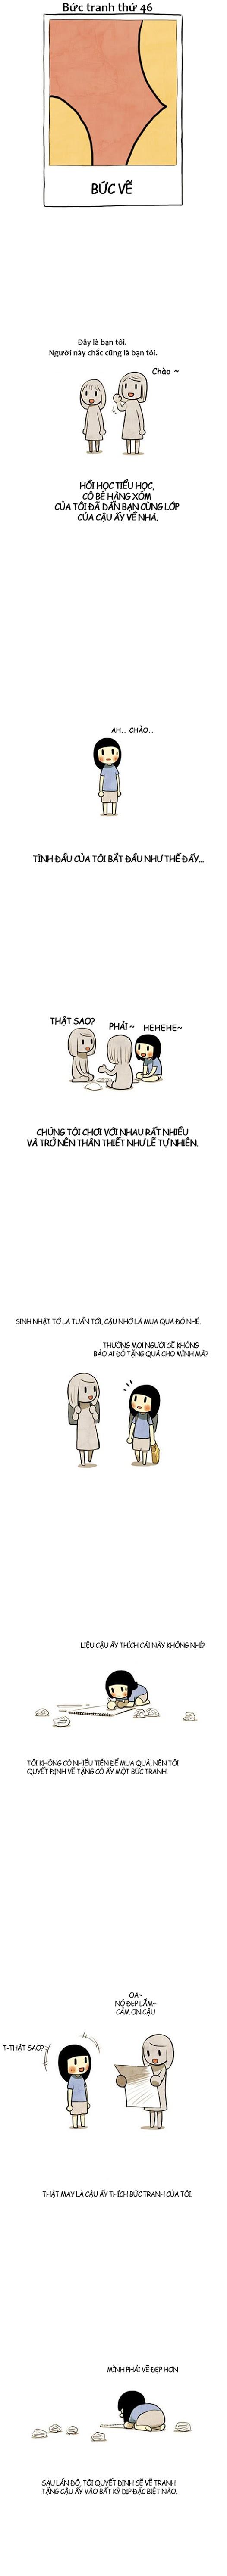 Smile Brush #81: Bức vẽ